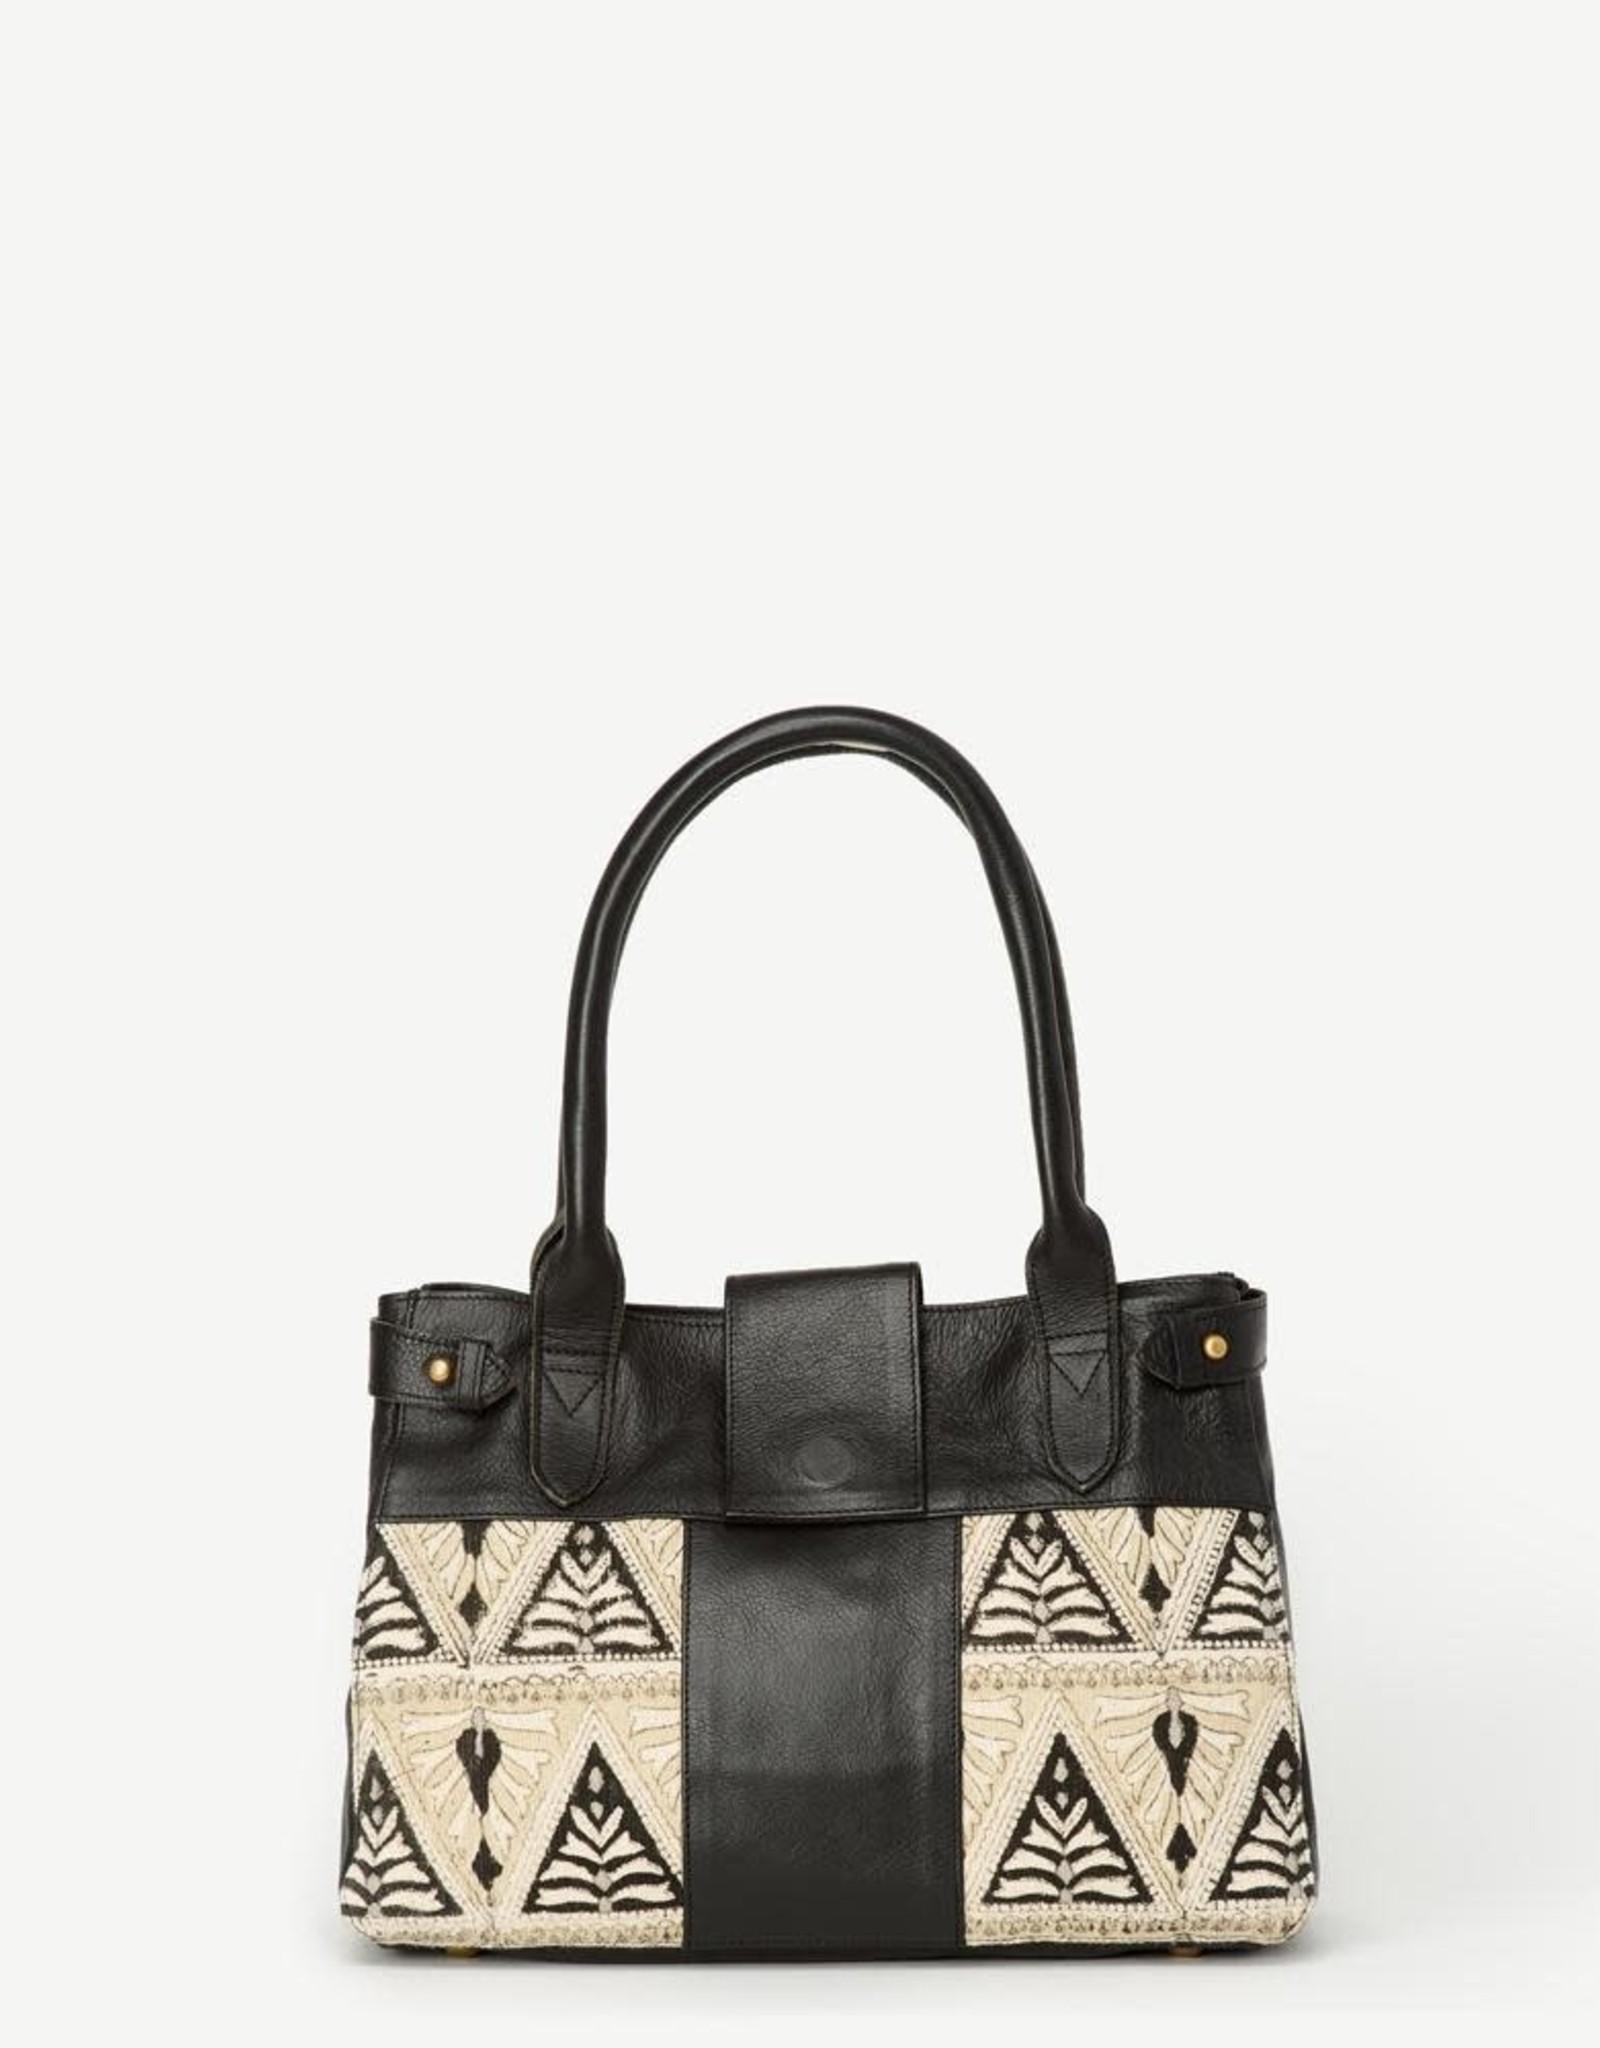 India,  Suneli Leather Handbag Indian Lace